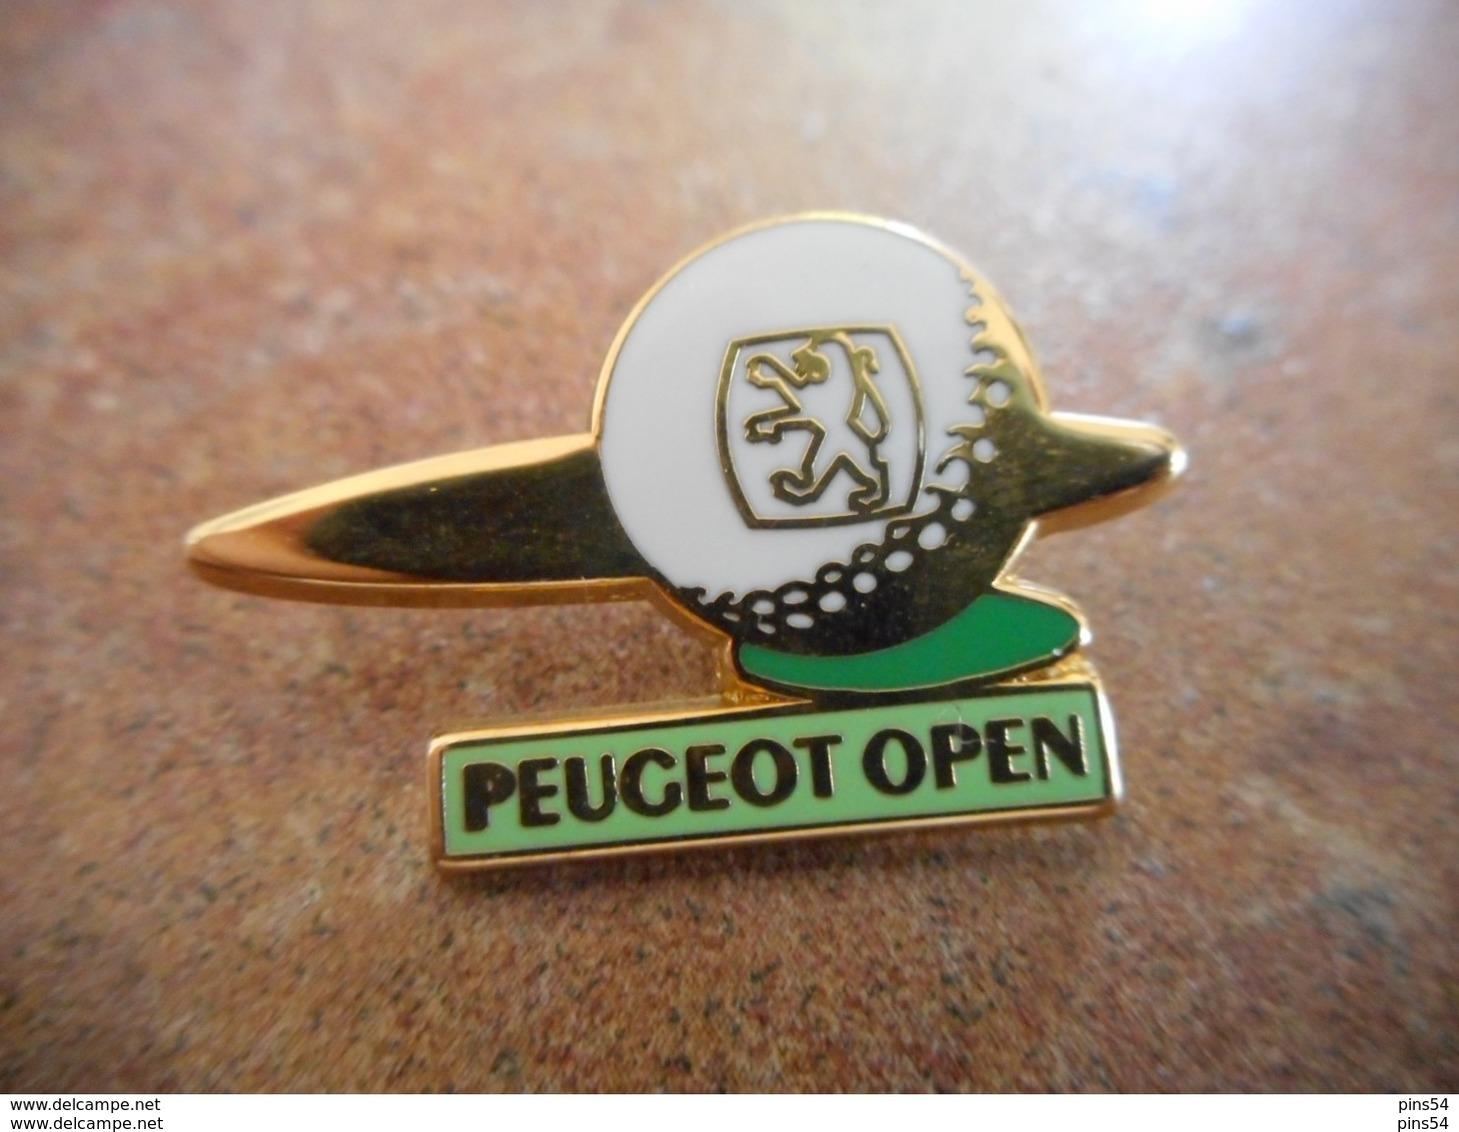 A010 -- Pin's Peugeot Open - Peugeot